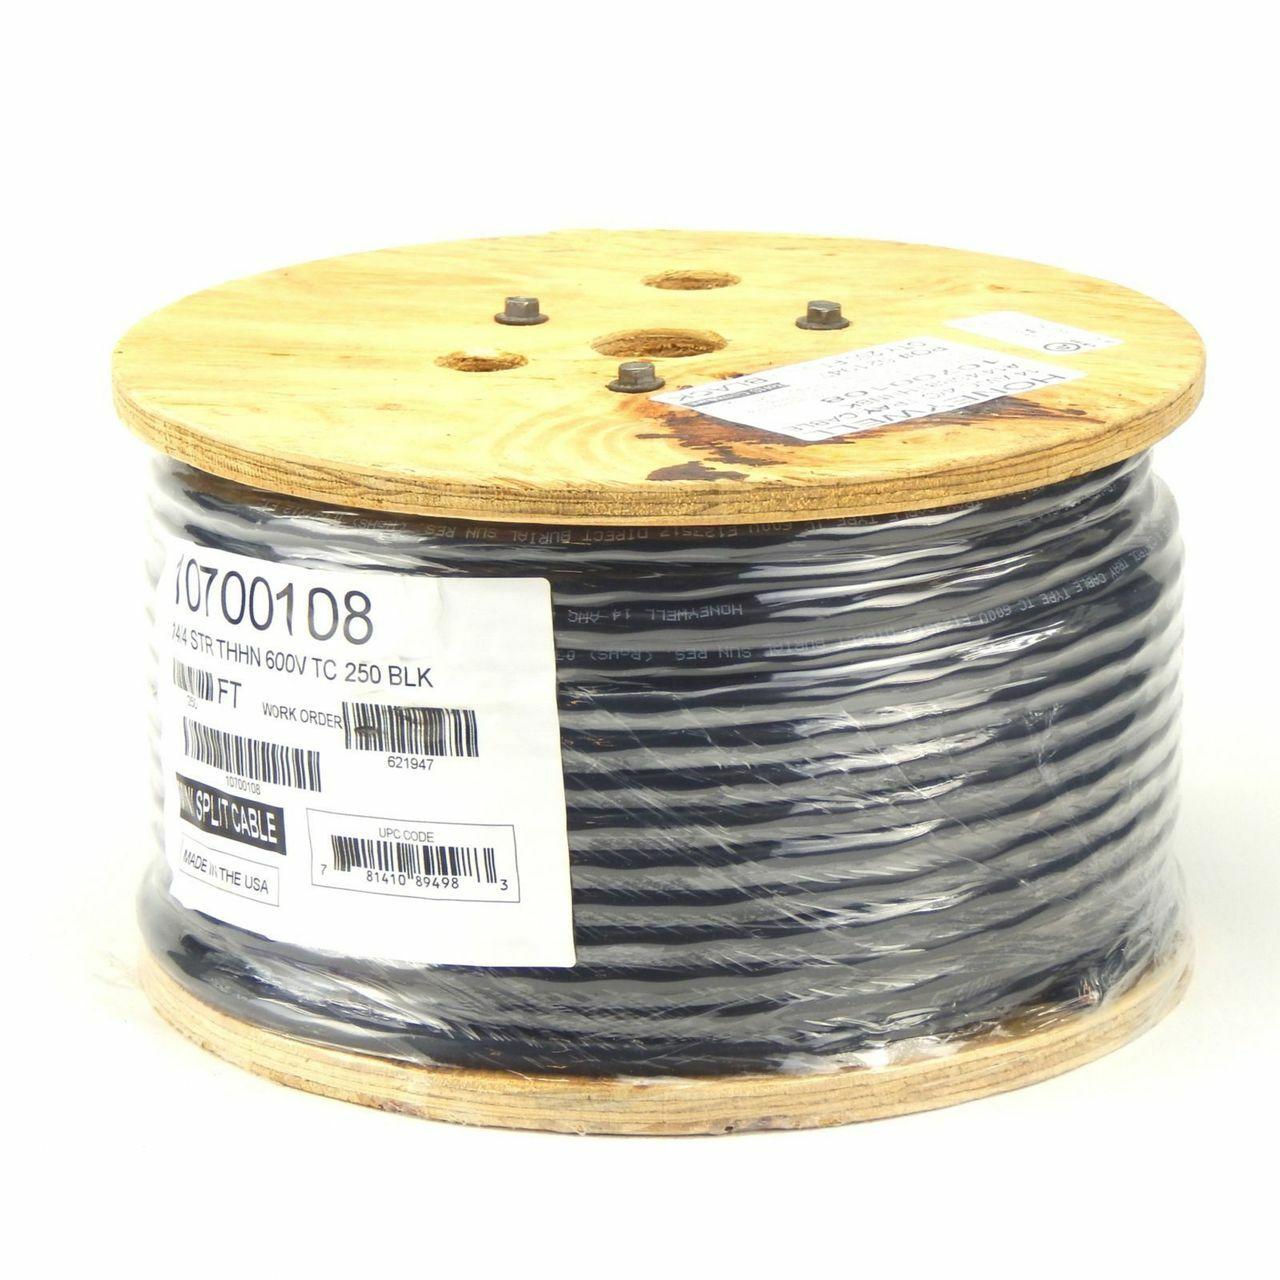 honeywell 10700108 250 foot roll 14 awg 4 conductor thhn mini split cable [ 1280 x 1280 Pixel ]